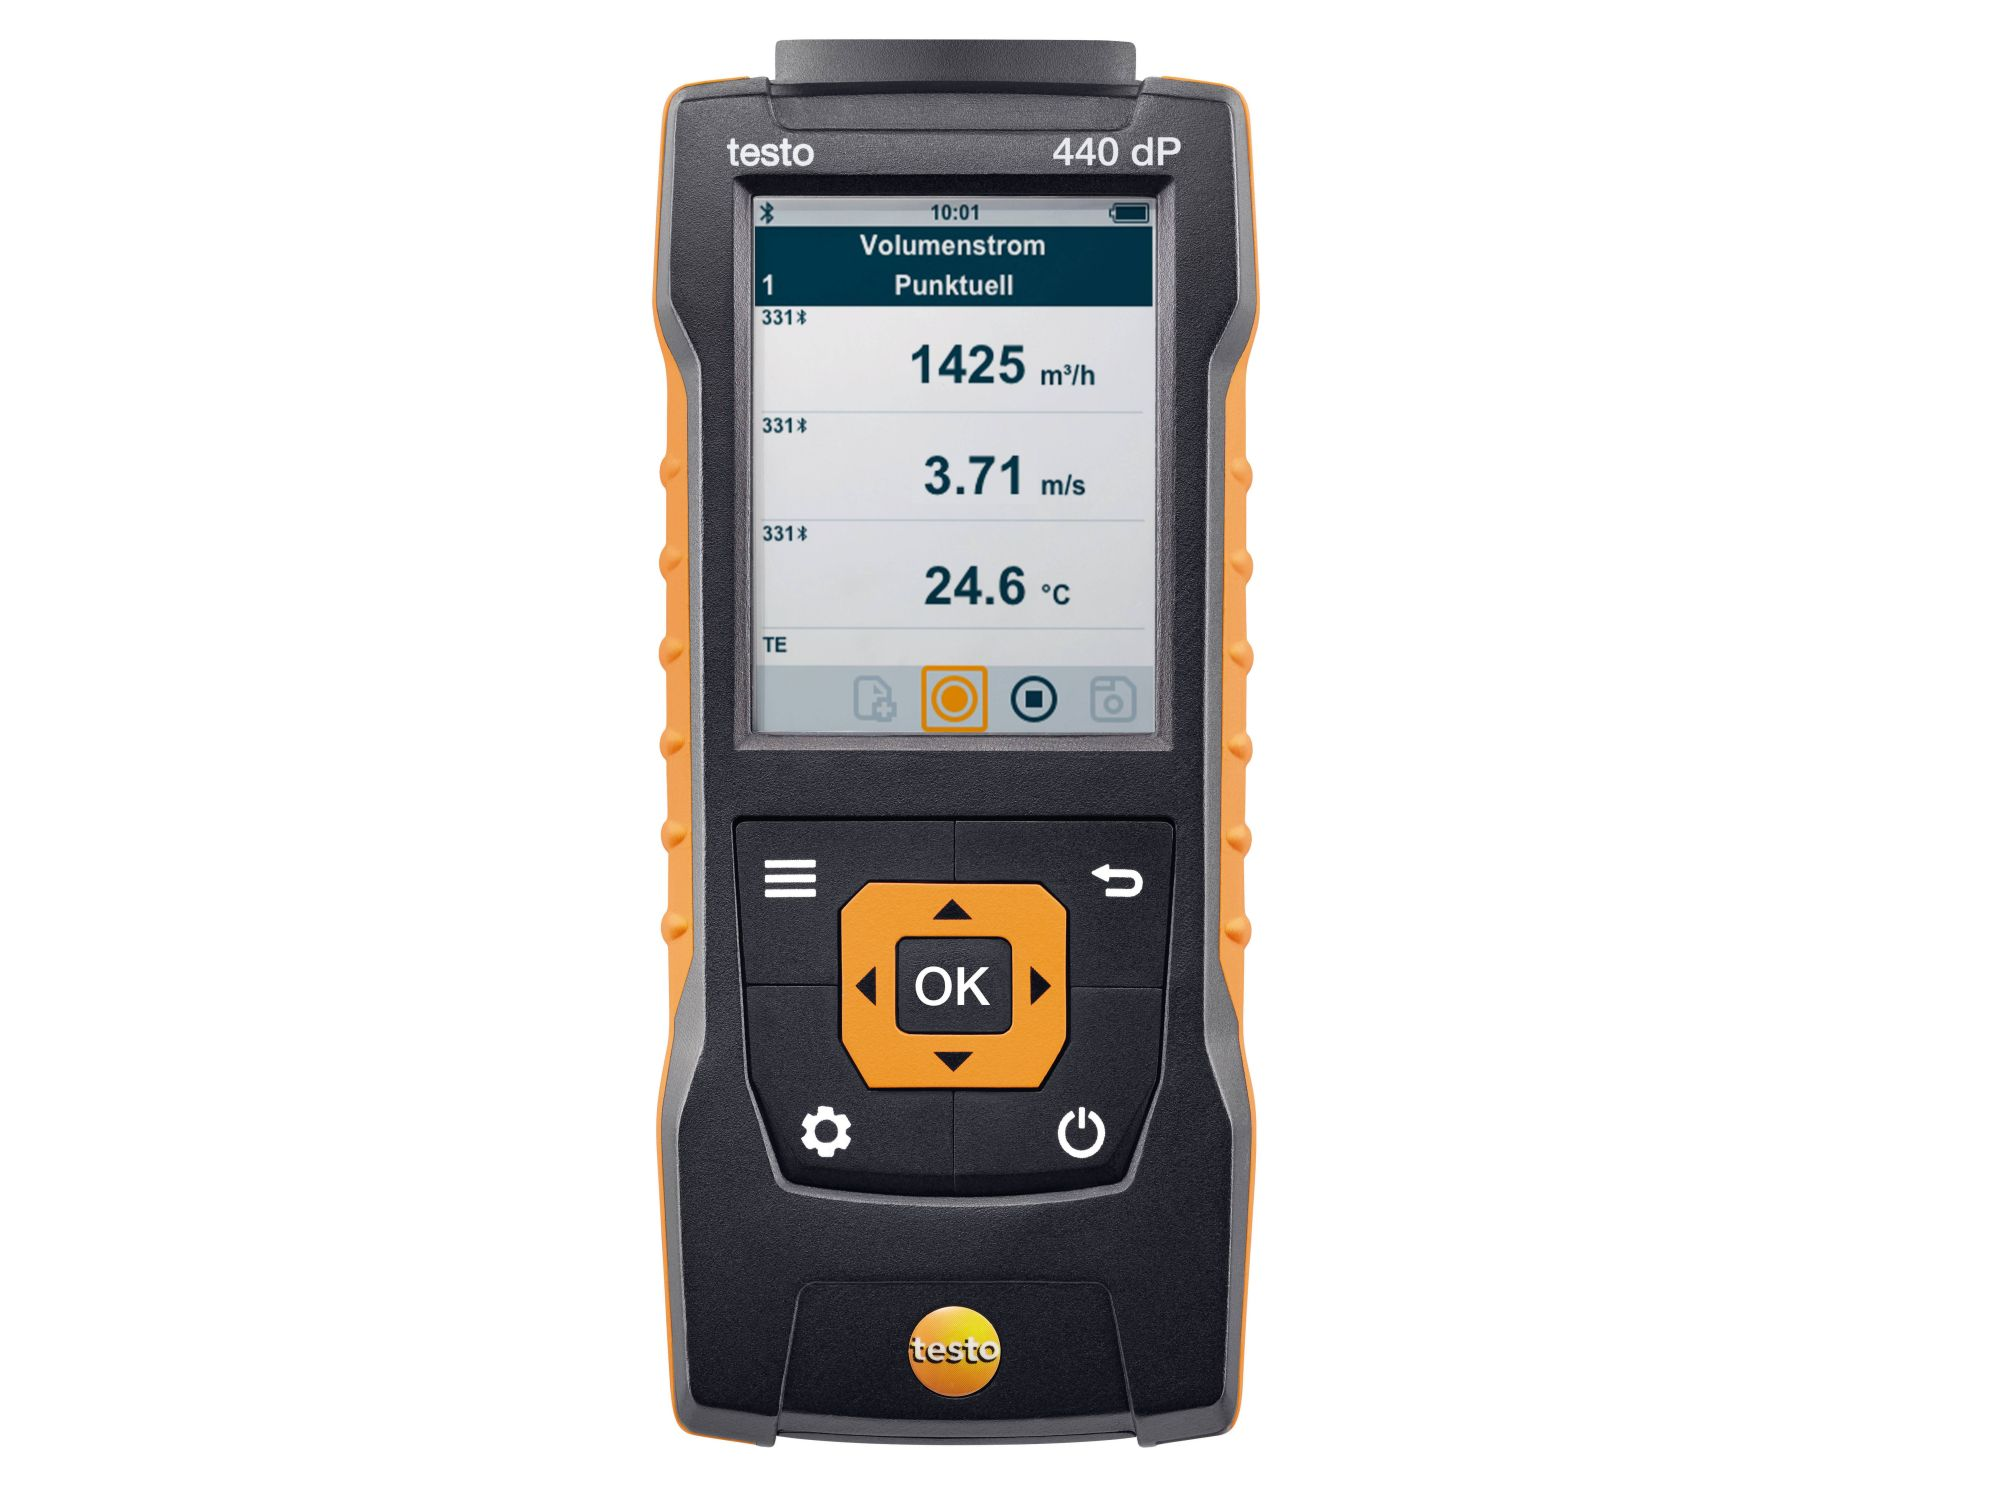 testo 440 dP Klimamessgerät inkl. Differenzdrucksensor